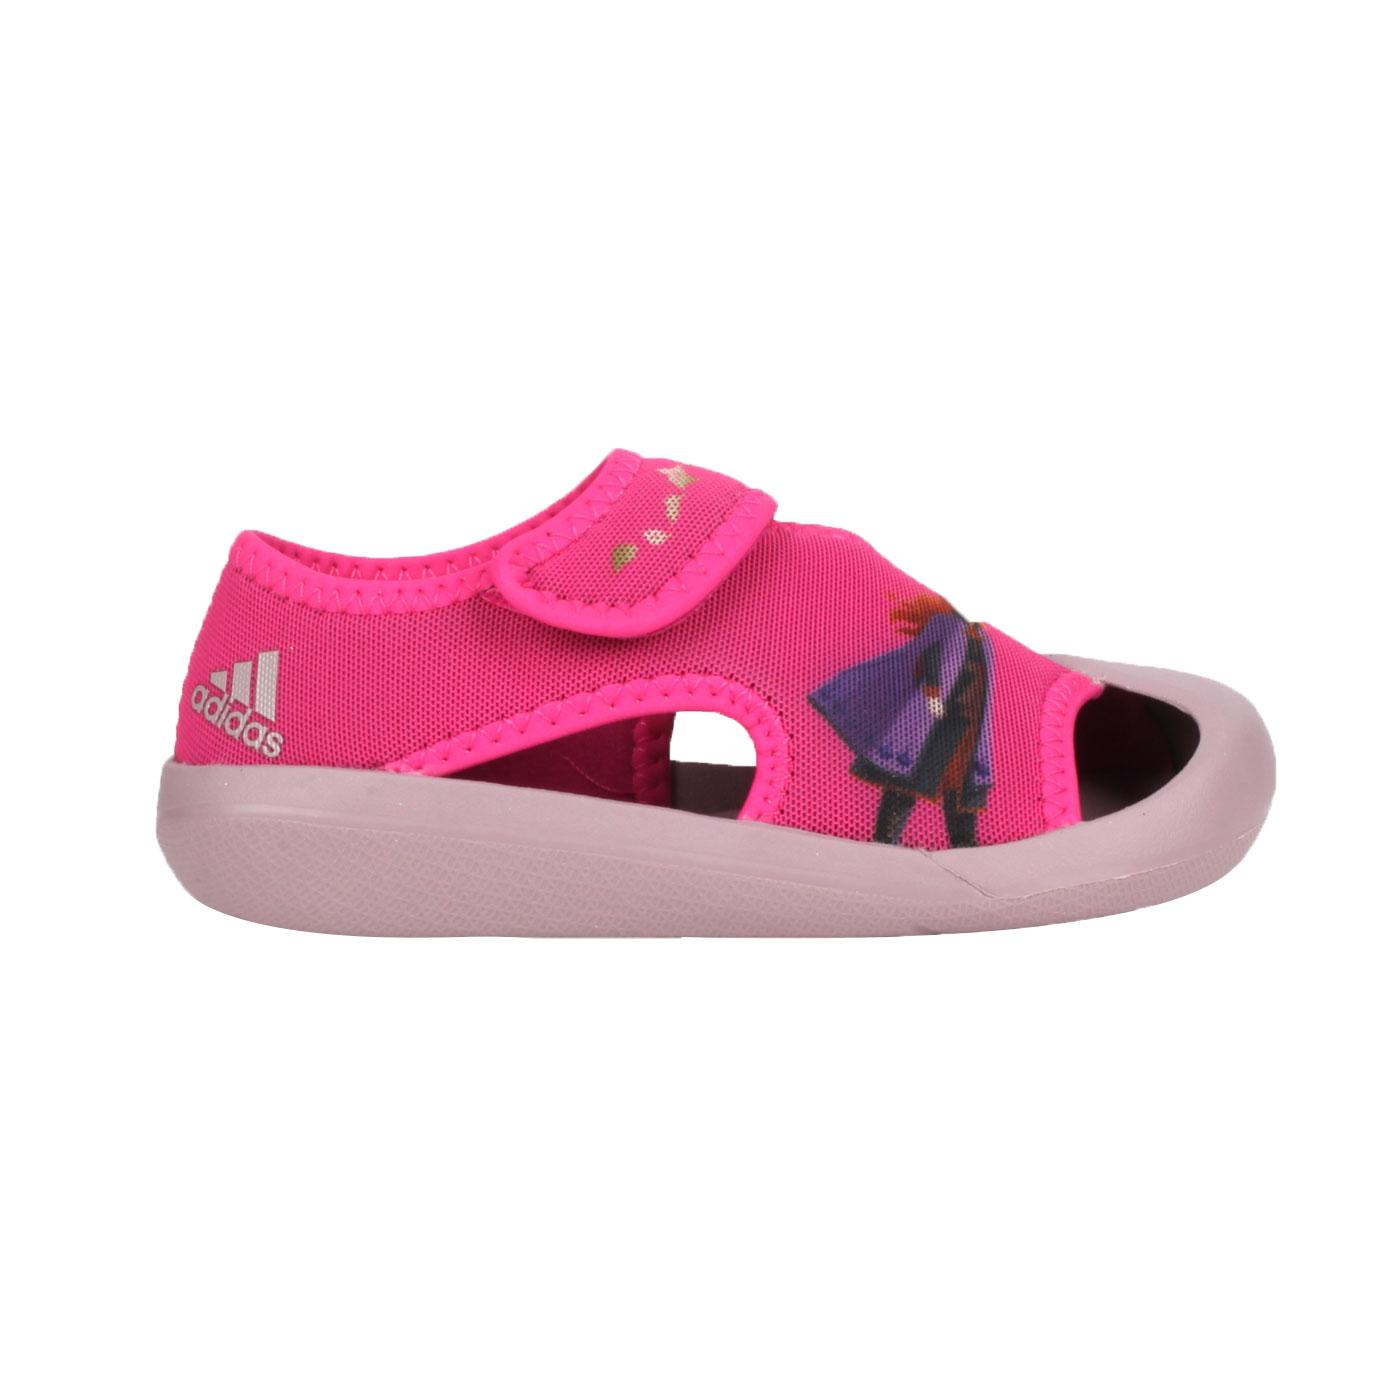 ADIDAS 小童冰雪奇緣涼鞋 FV4652